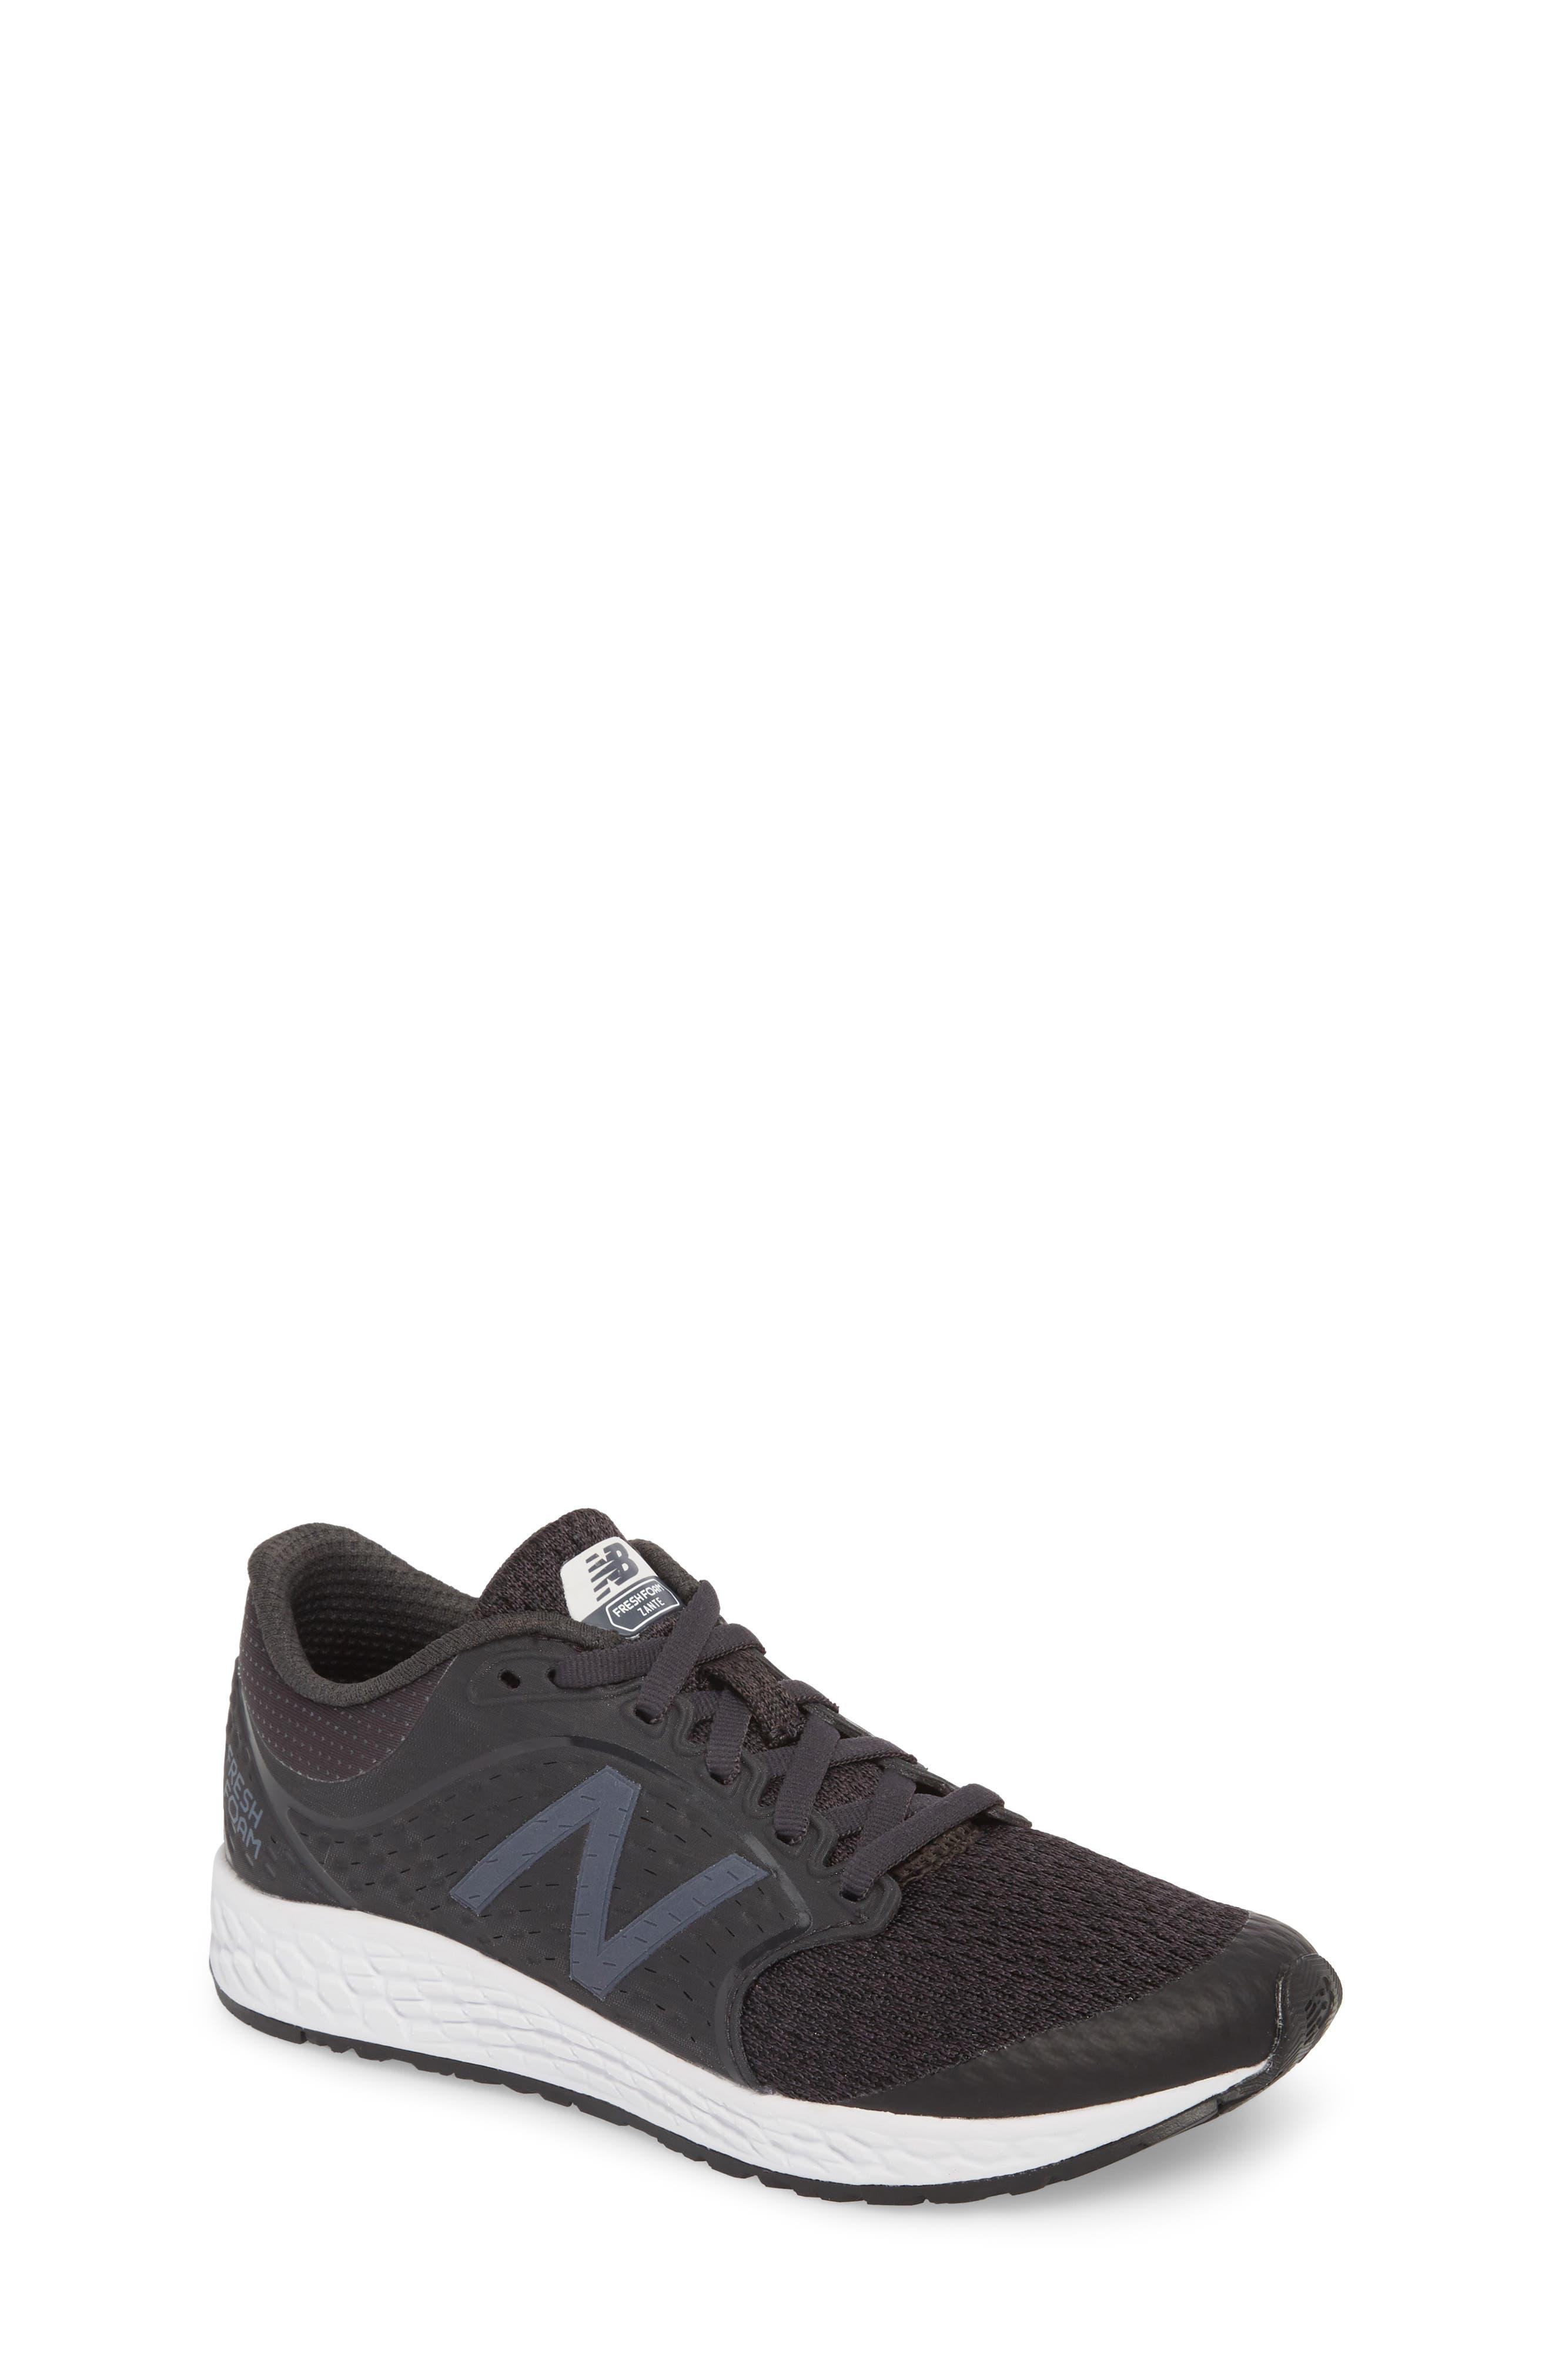 Fresh Foam Zante v4 Running Shoe,                         Main,                         color, 001